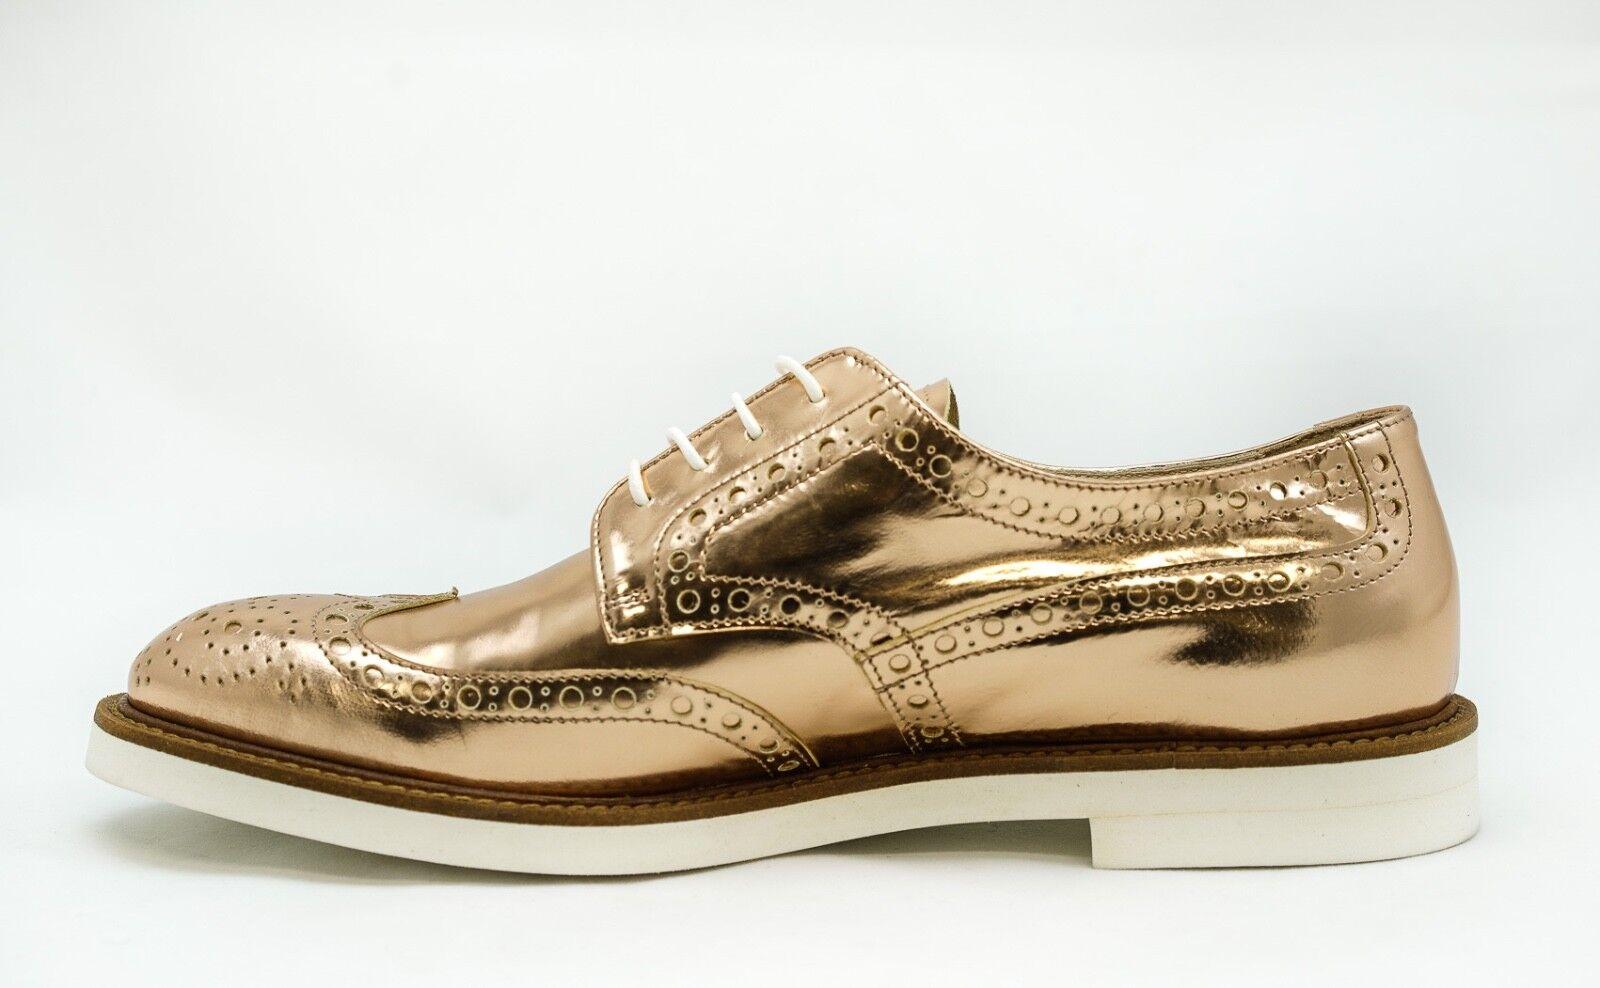 New in Box Box Box Roberto Serpentini Women's pink gold Leather Brogues 1703 e11448